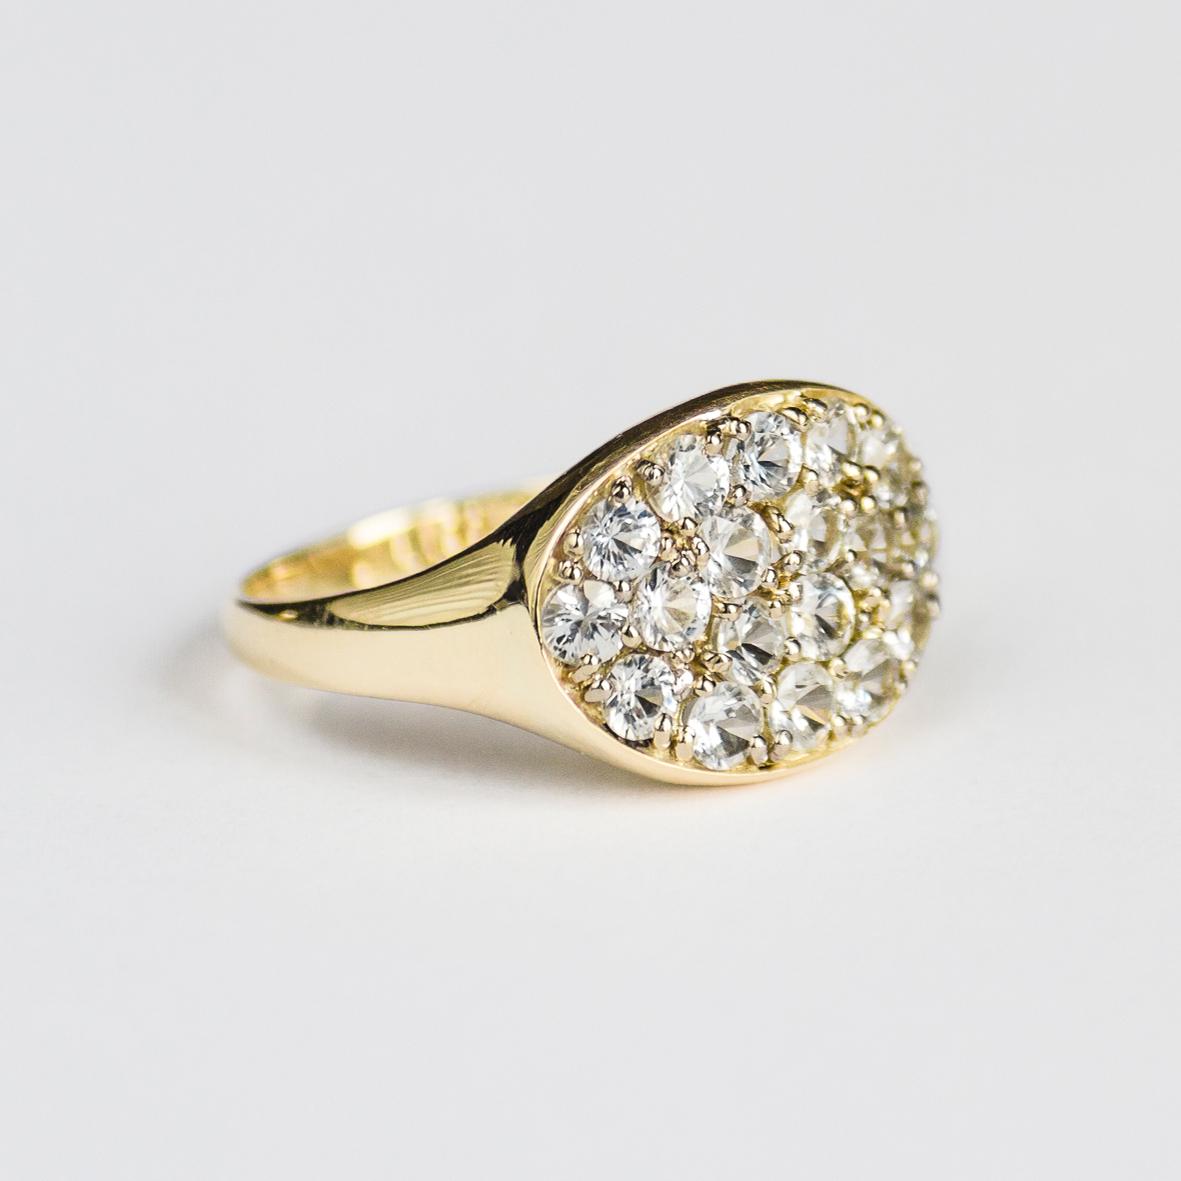 1. OONA_lotus_principal_signet sapphire ring